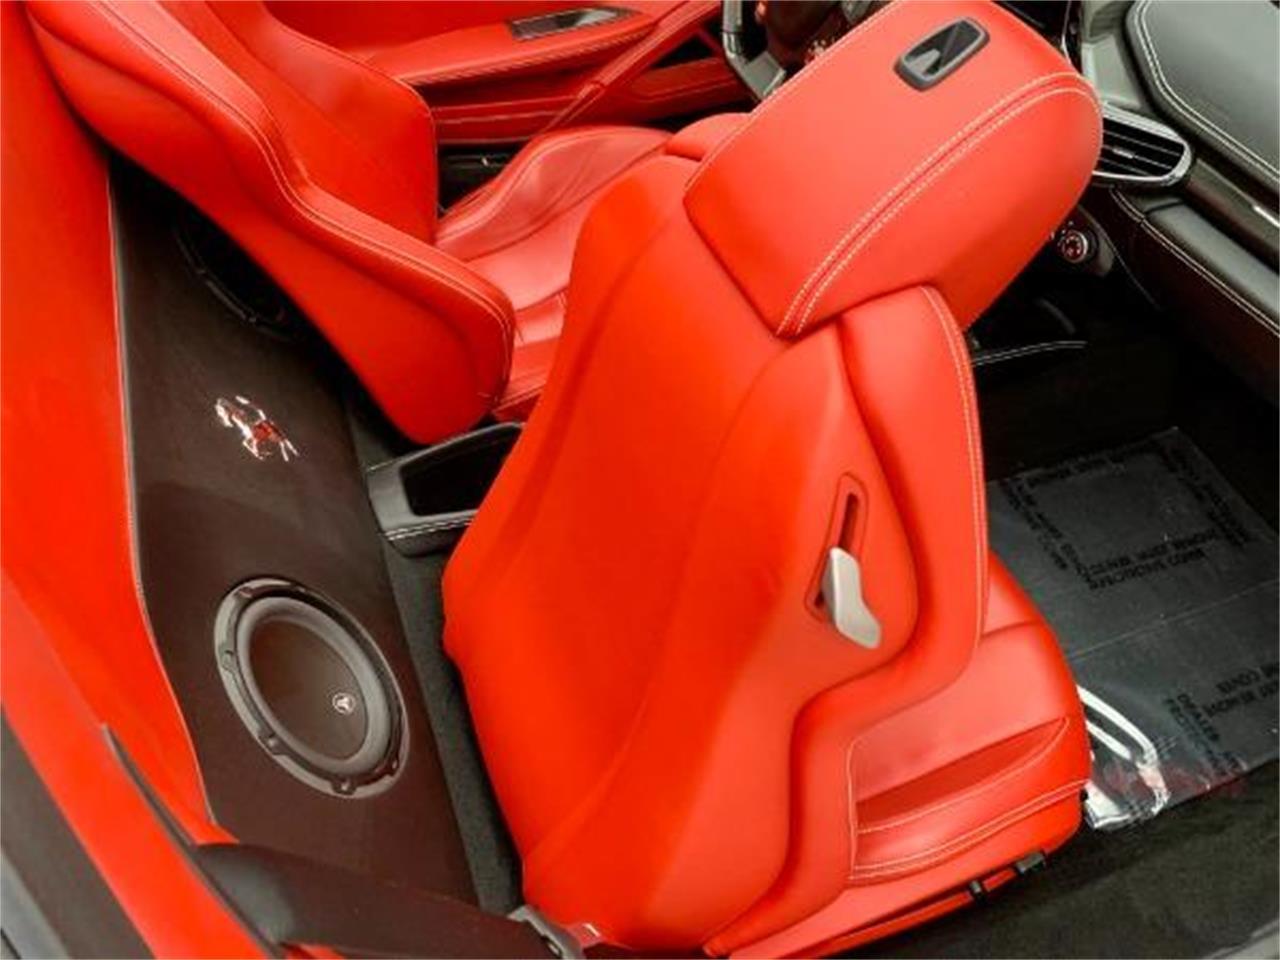 2015 Ferrari 458 (CC-1419715) for sale in Syosset, New York